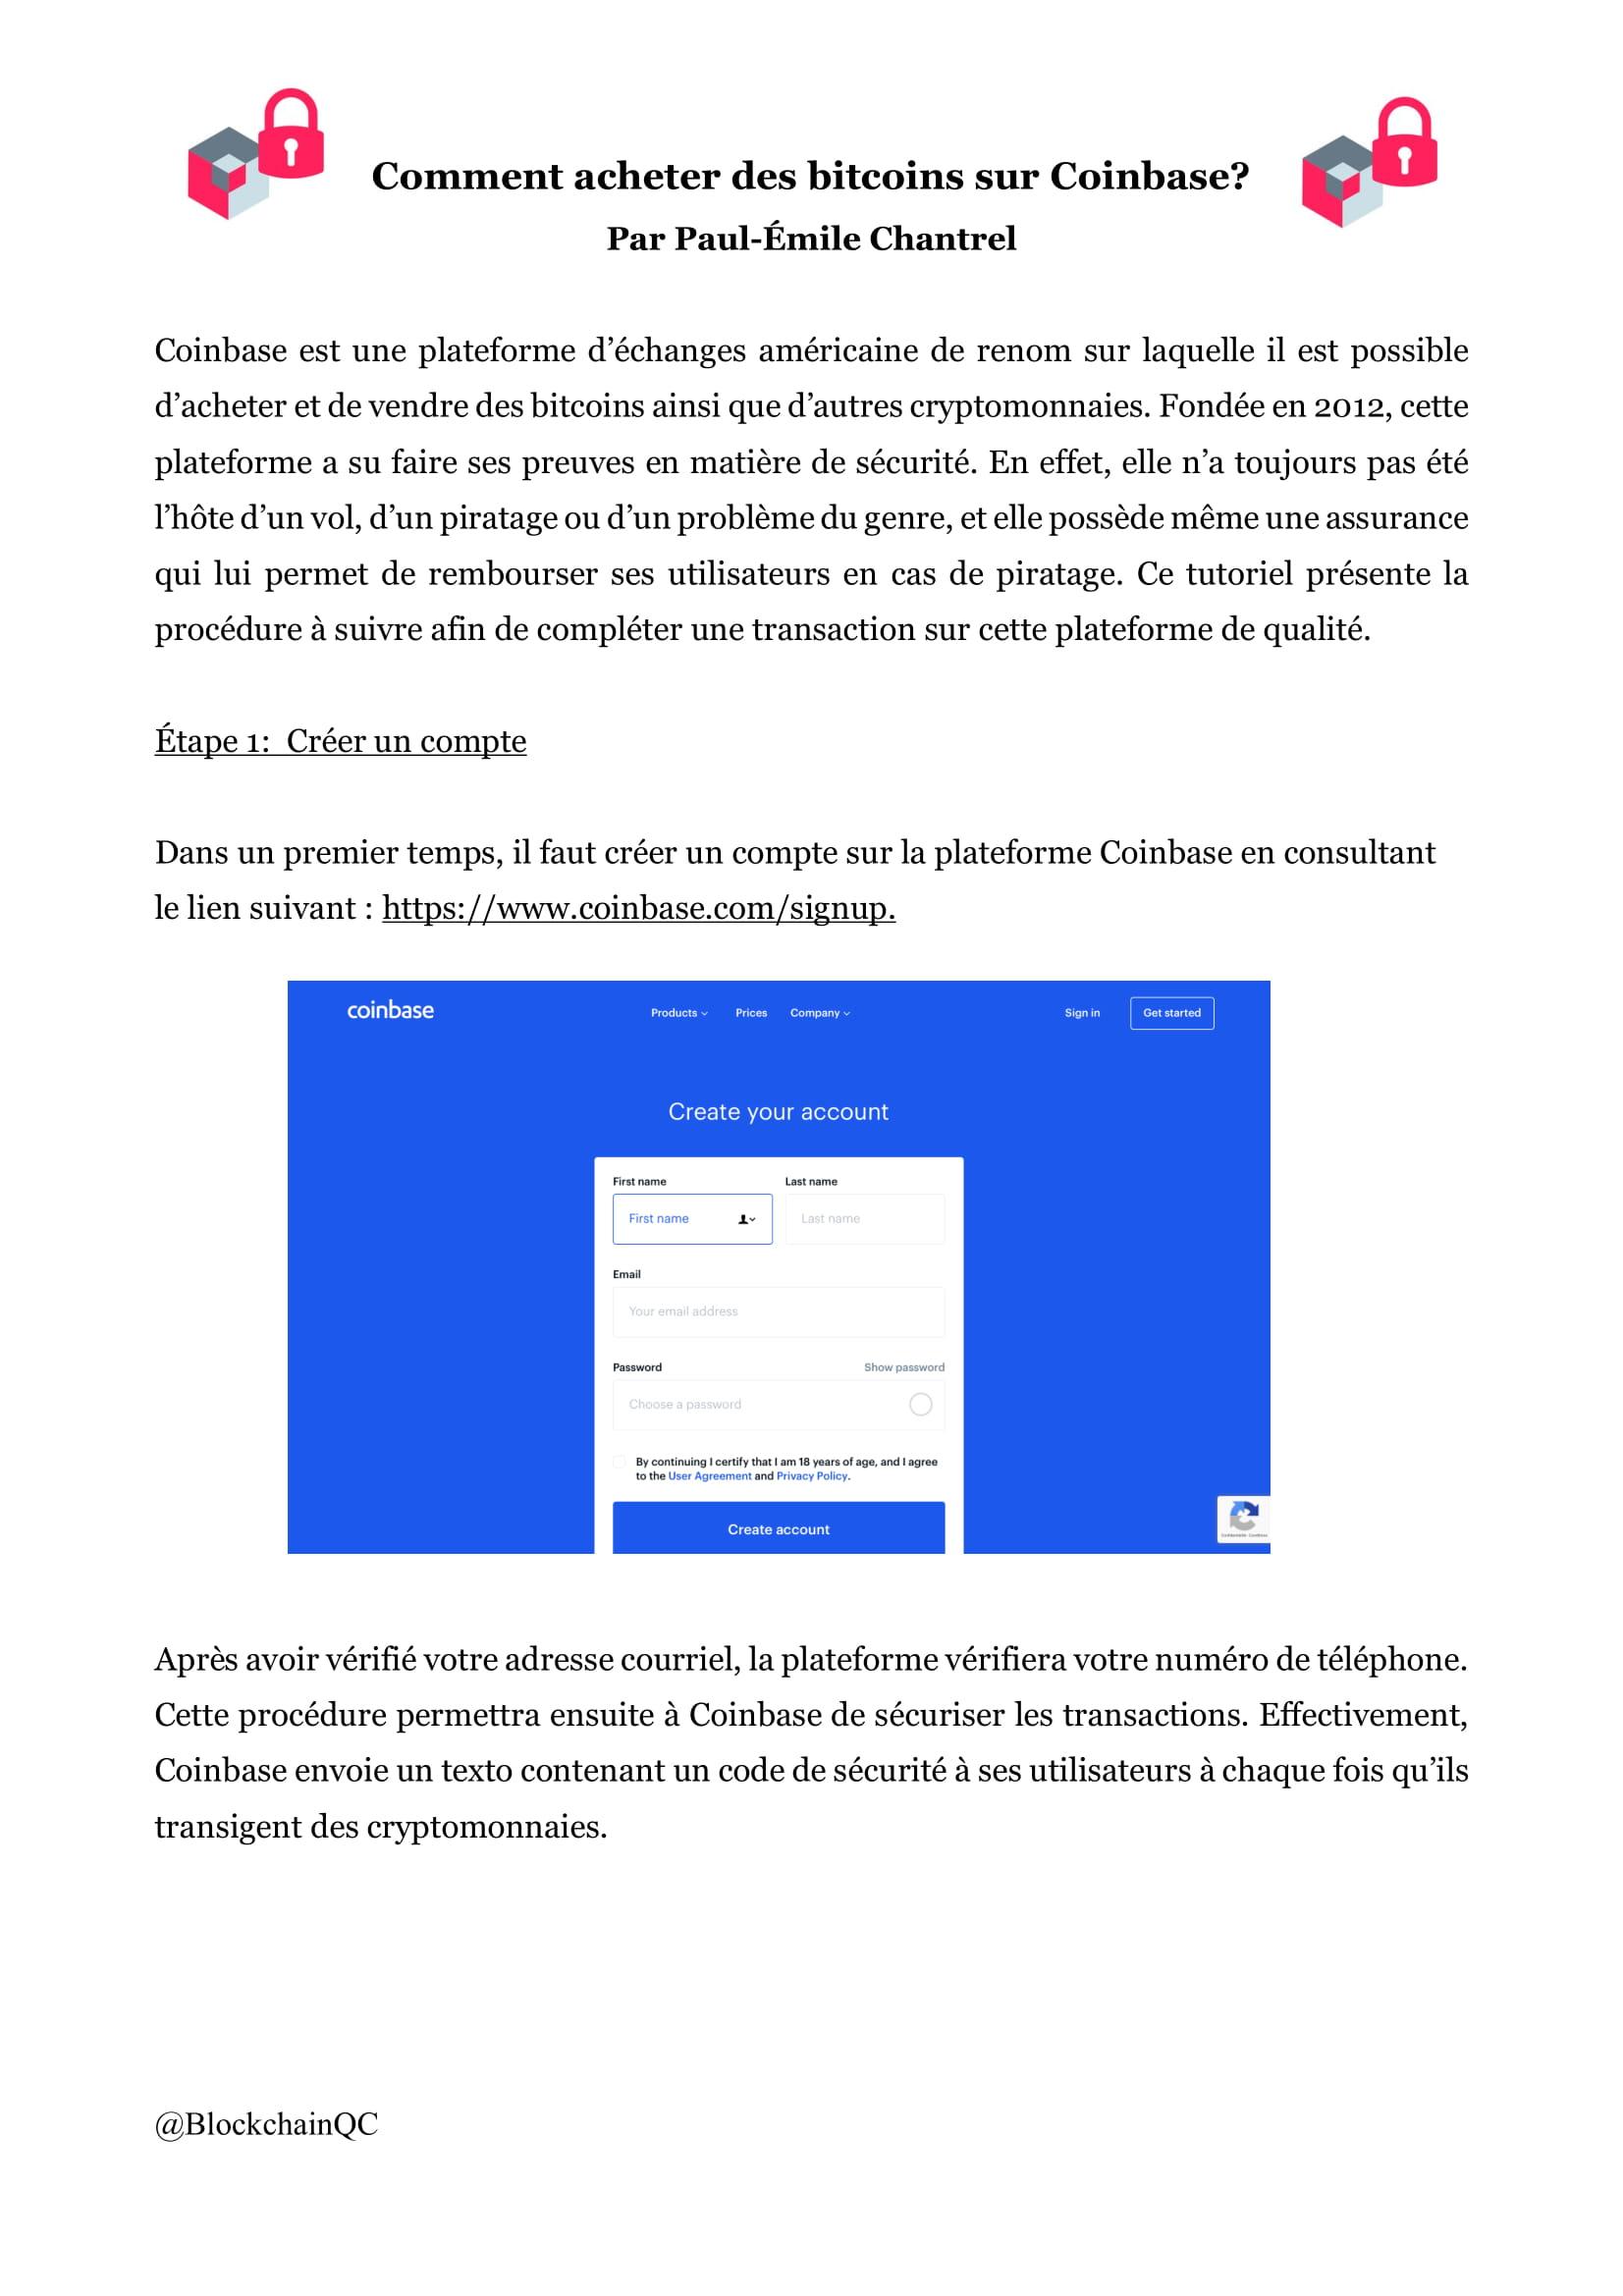 Coinbase(11)-1.jpg